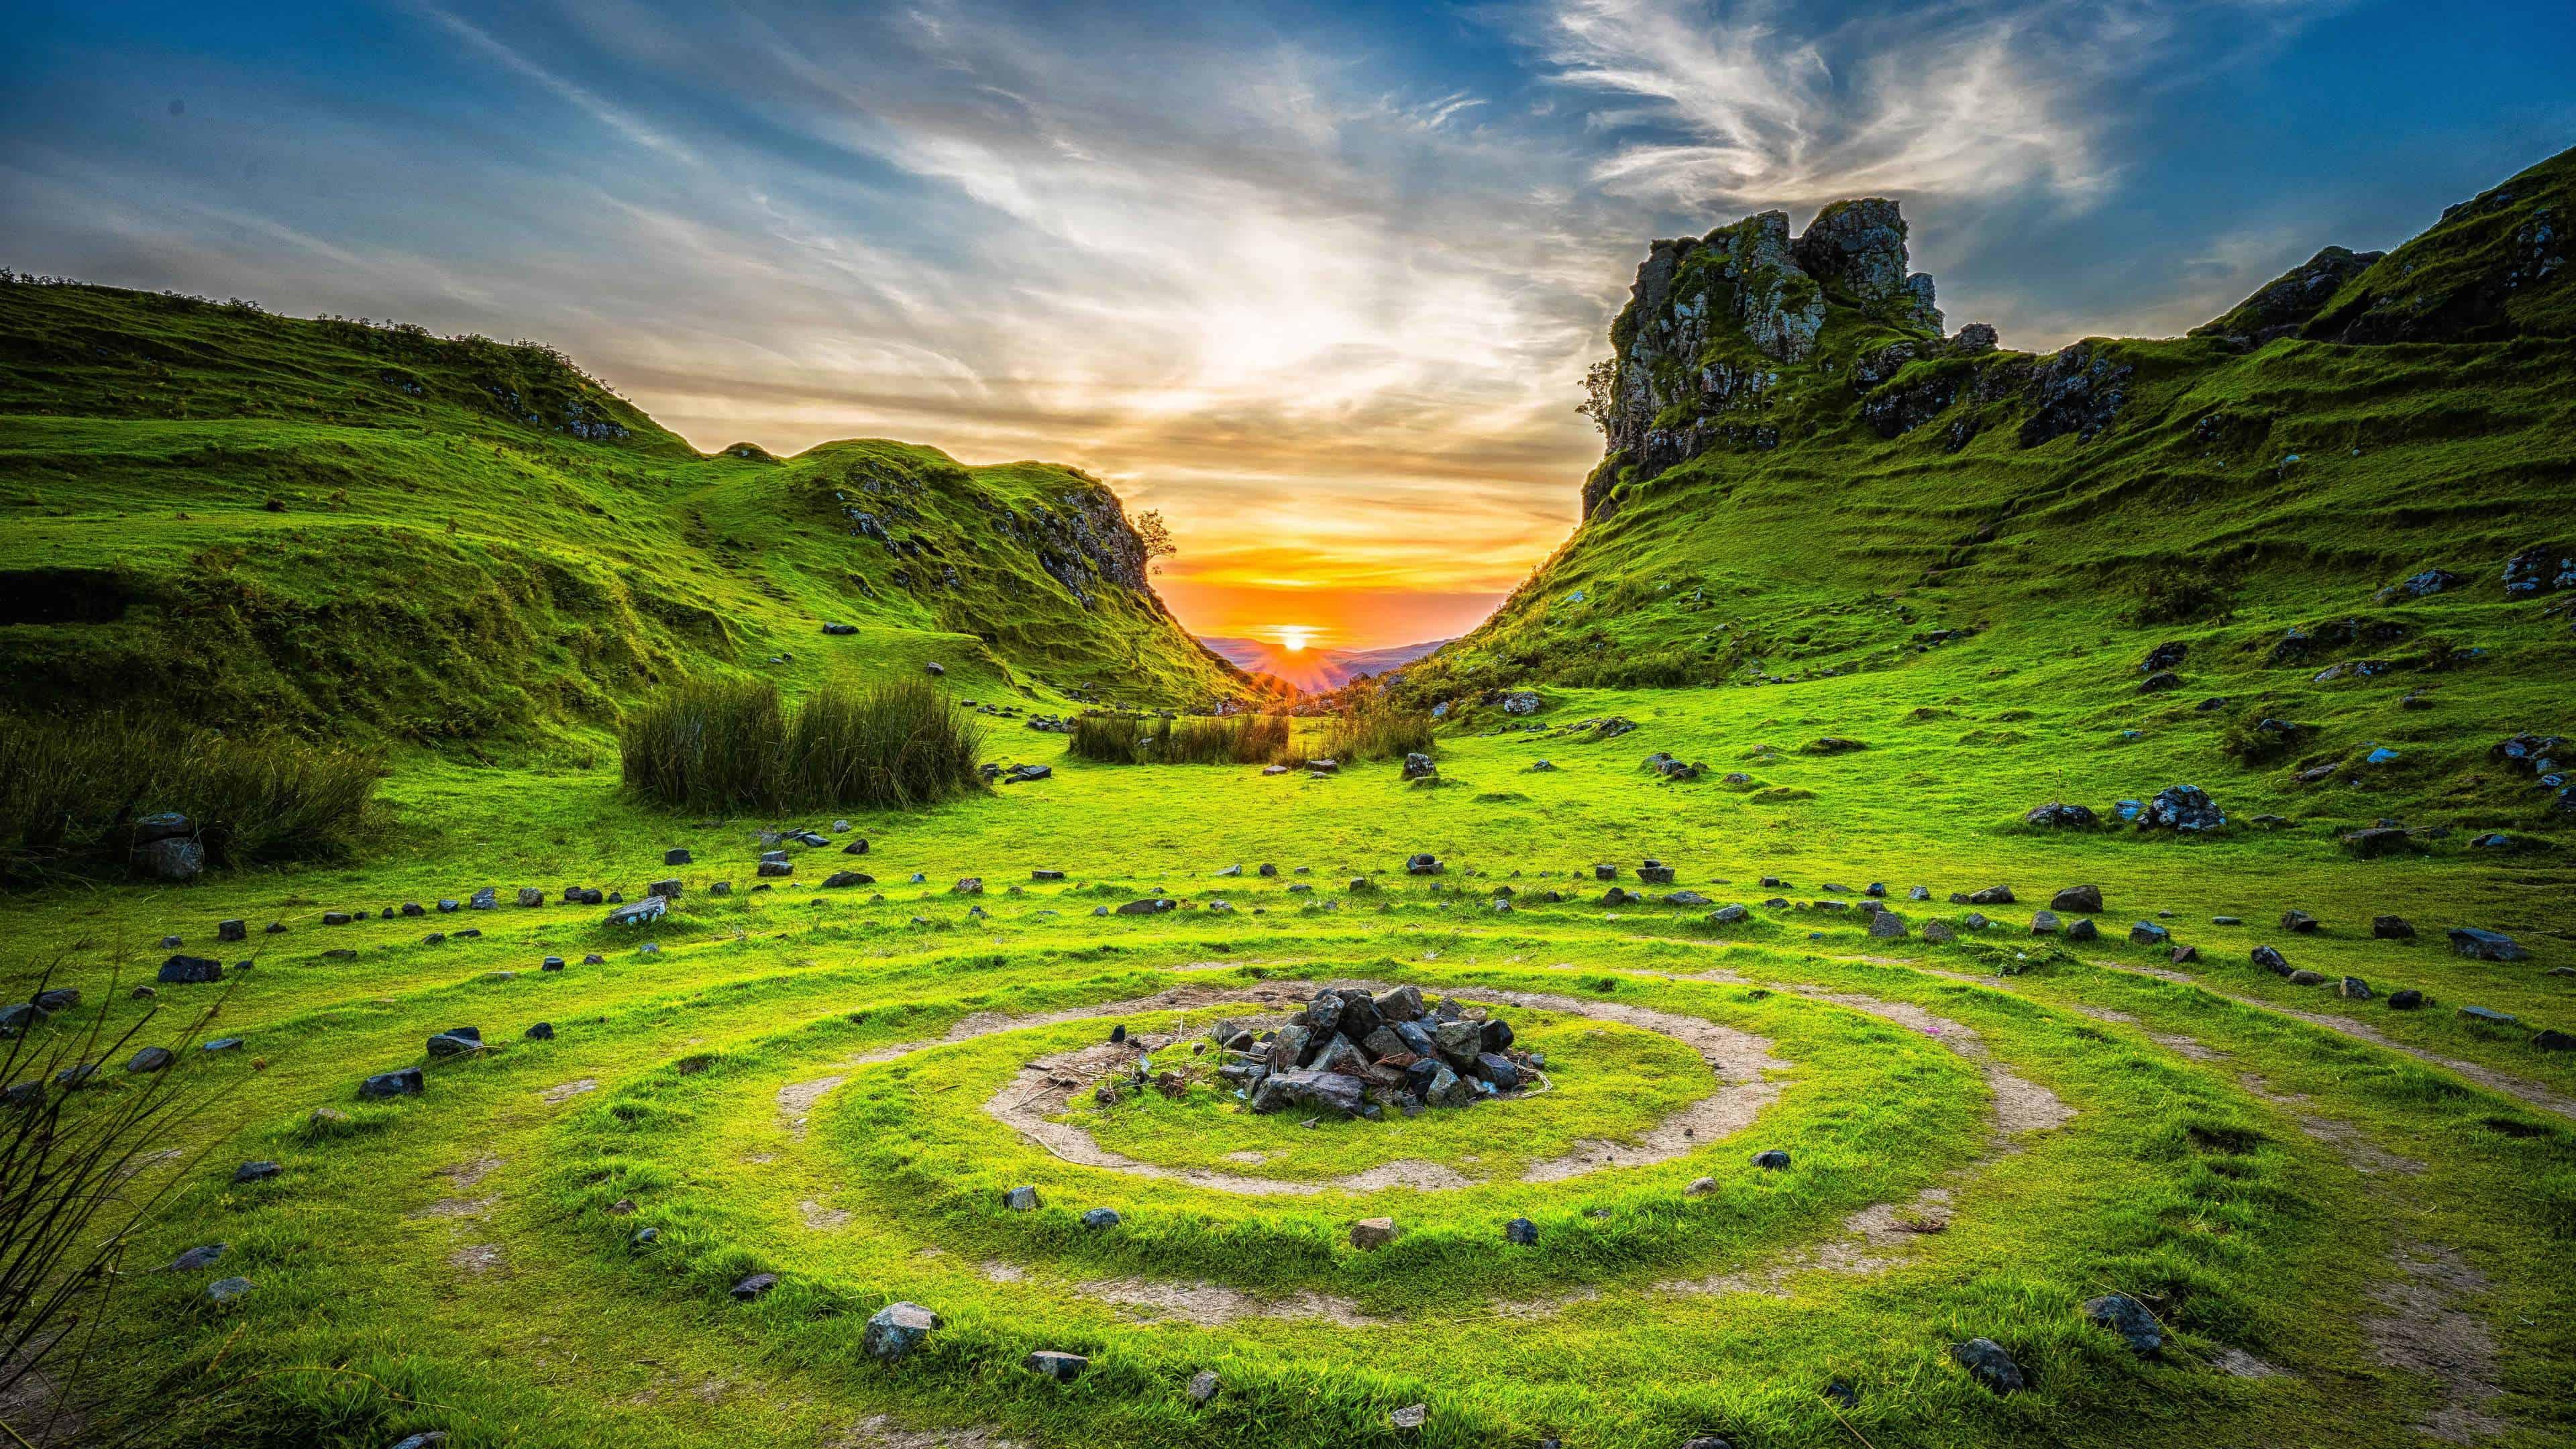 Fairy Glen Isle Of Skye Scotland UHD 4K Wallpaper Pixelz 3840x2160